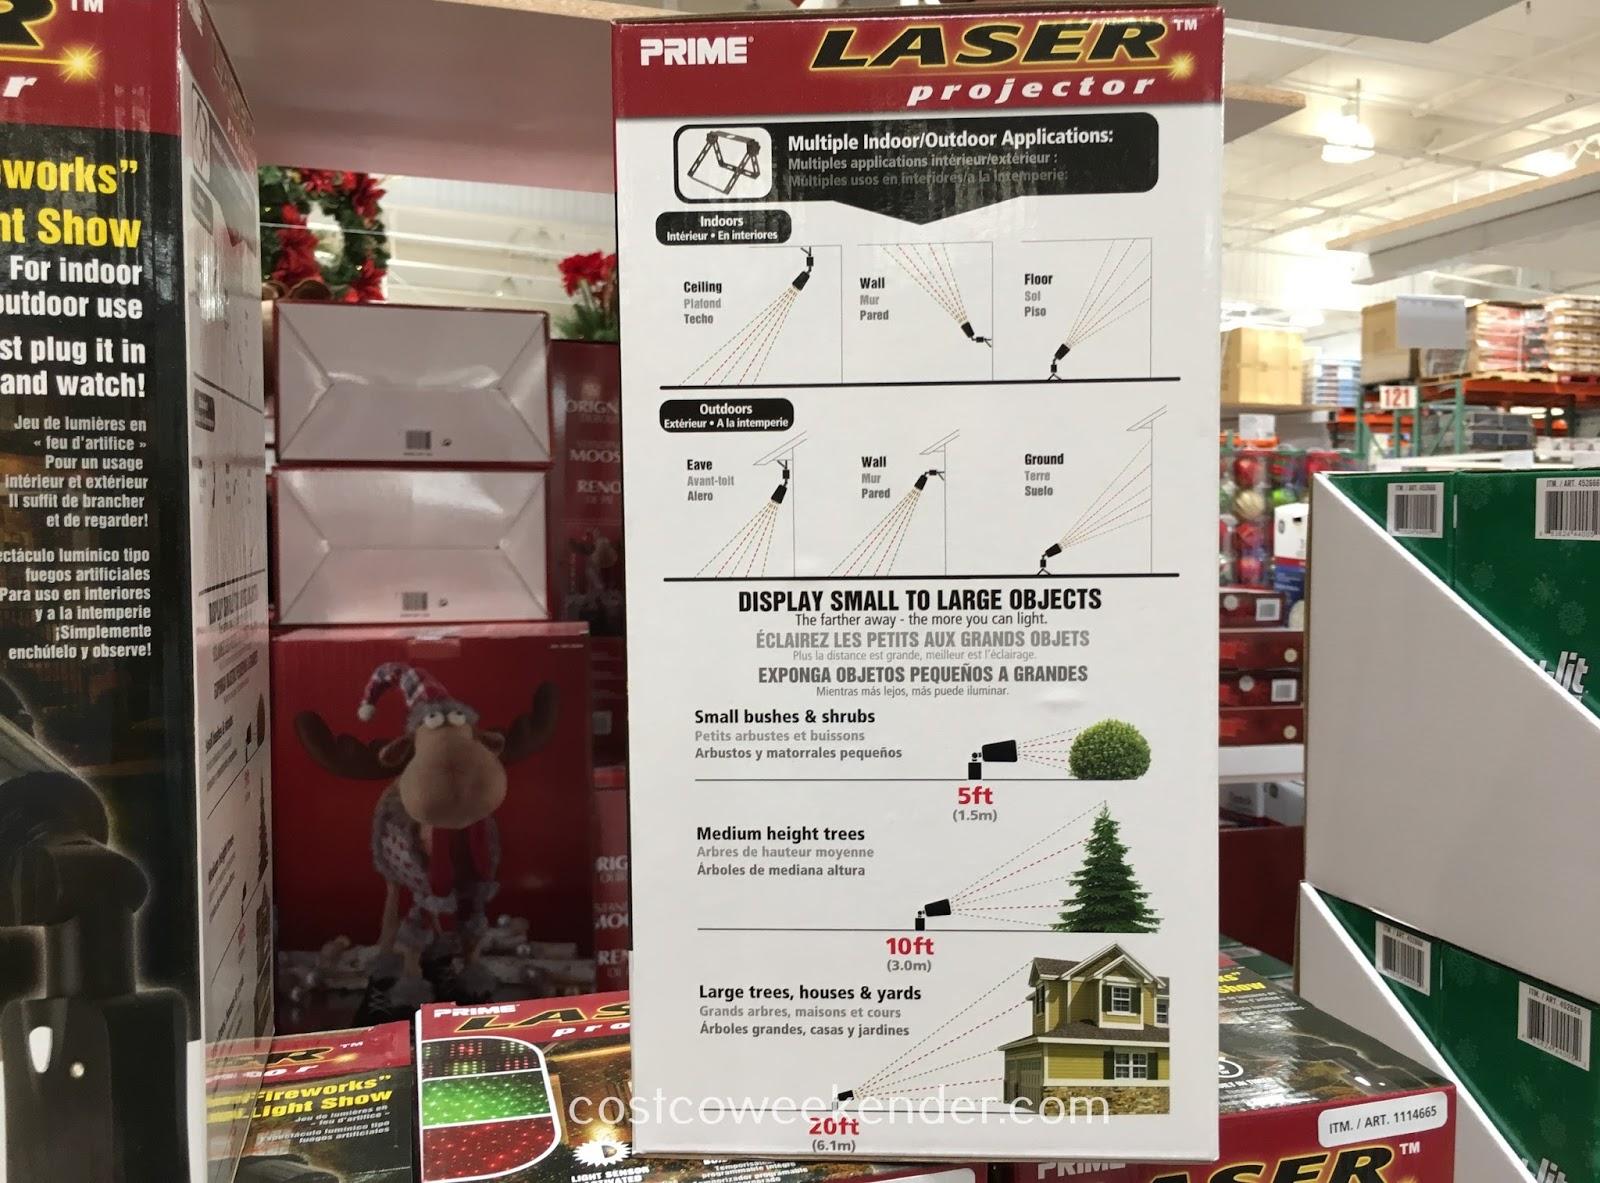 Prime Laser Projector (model LFLRGM505)   Costco Weekender